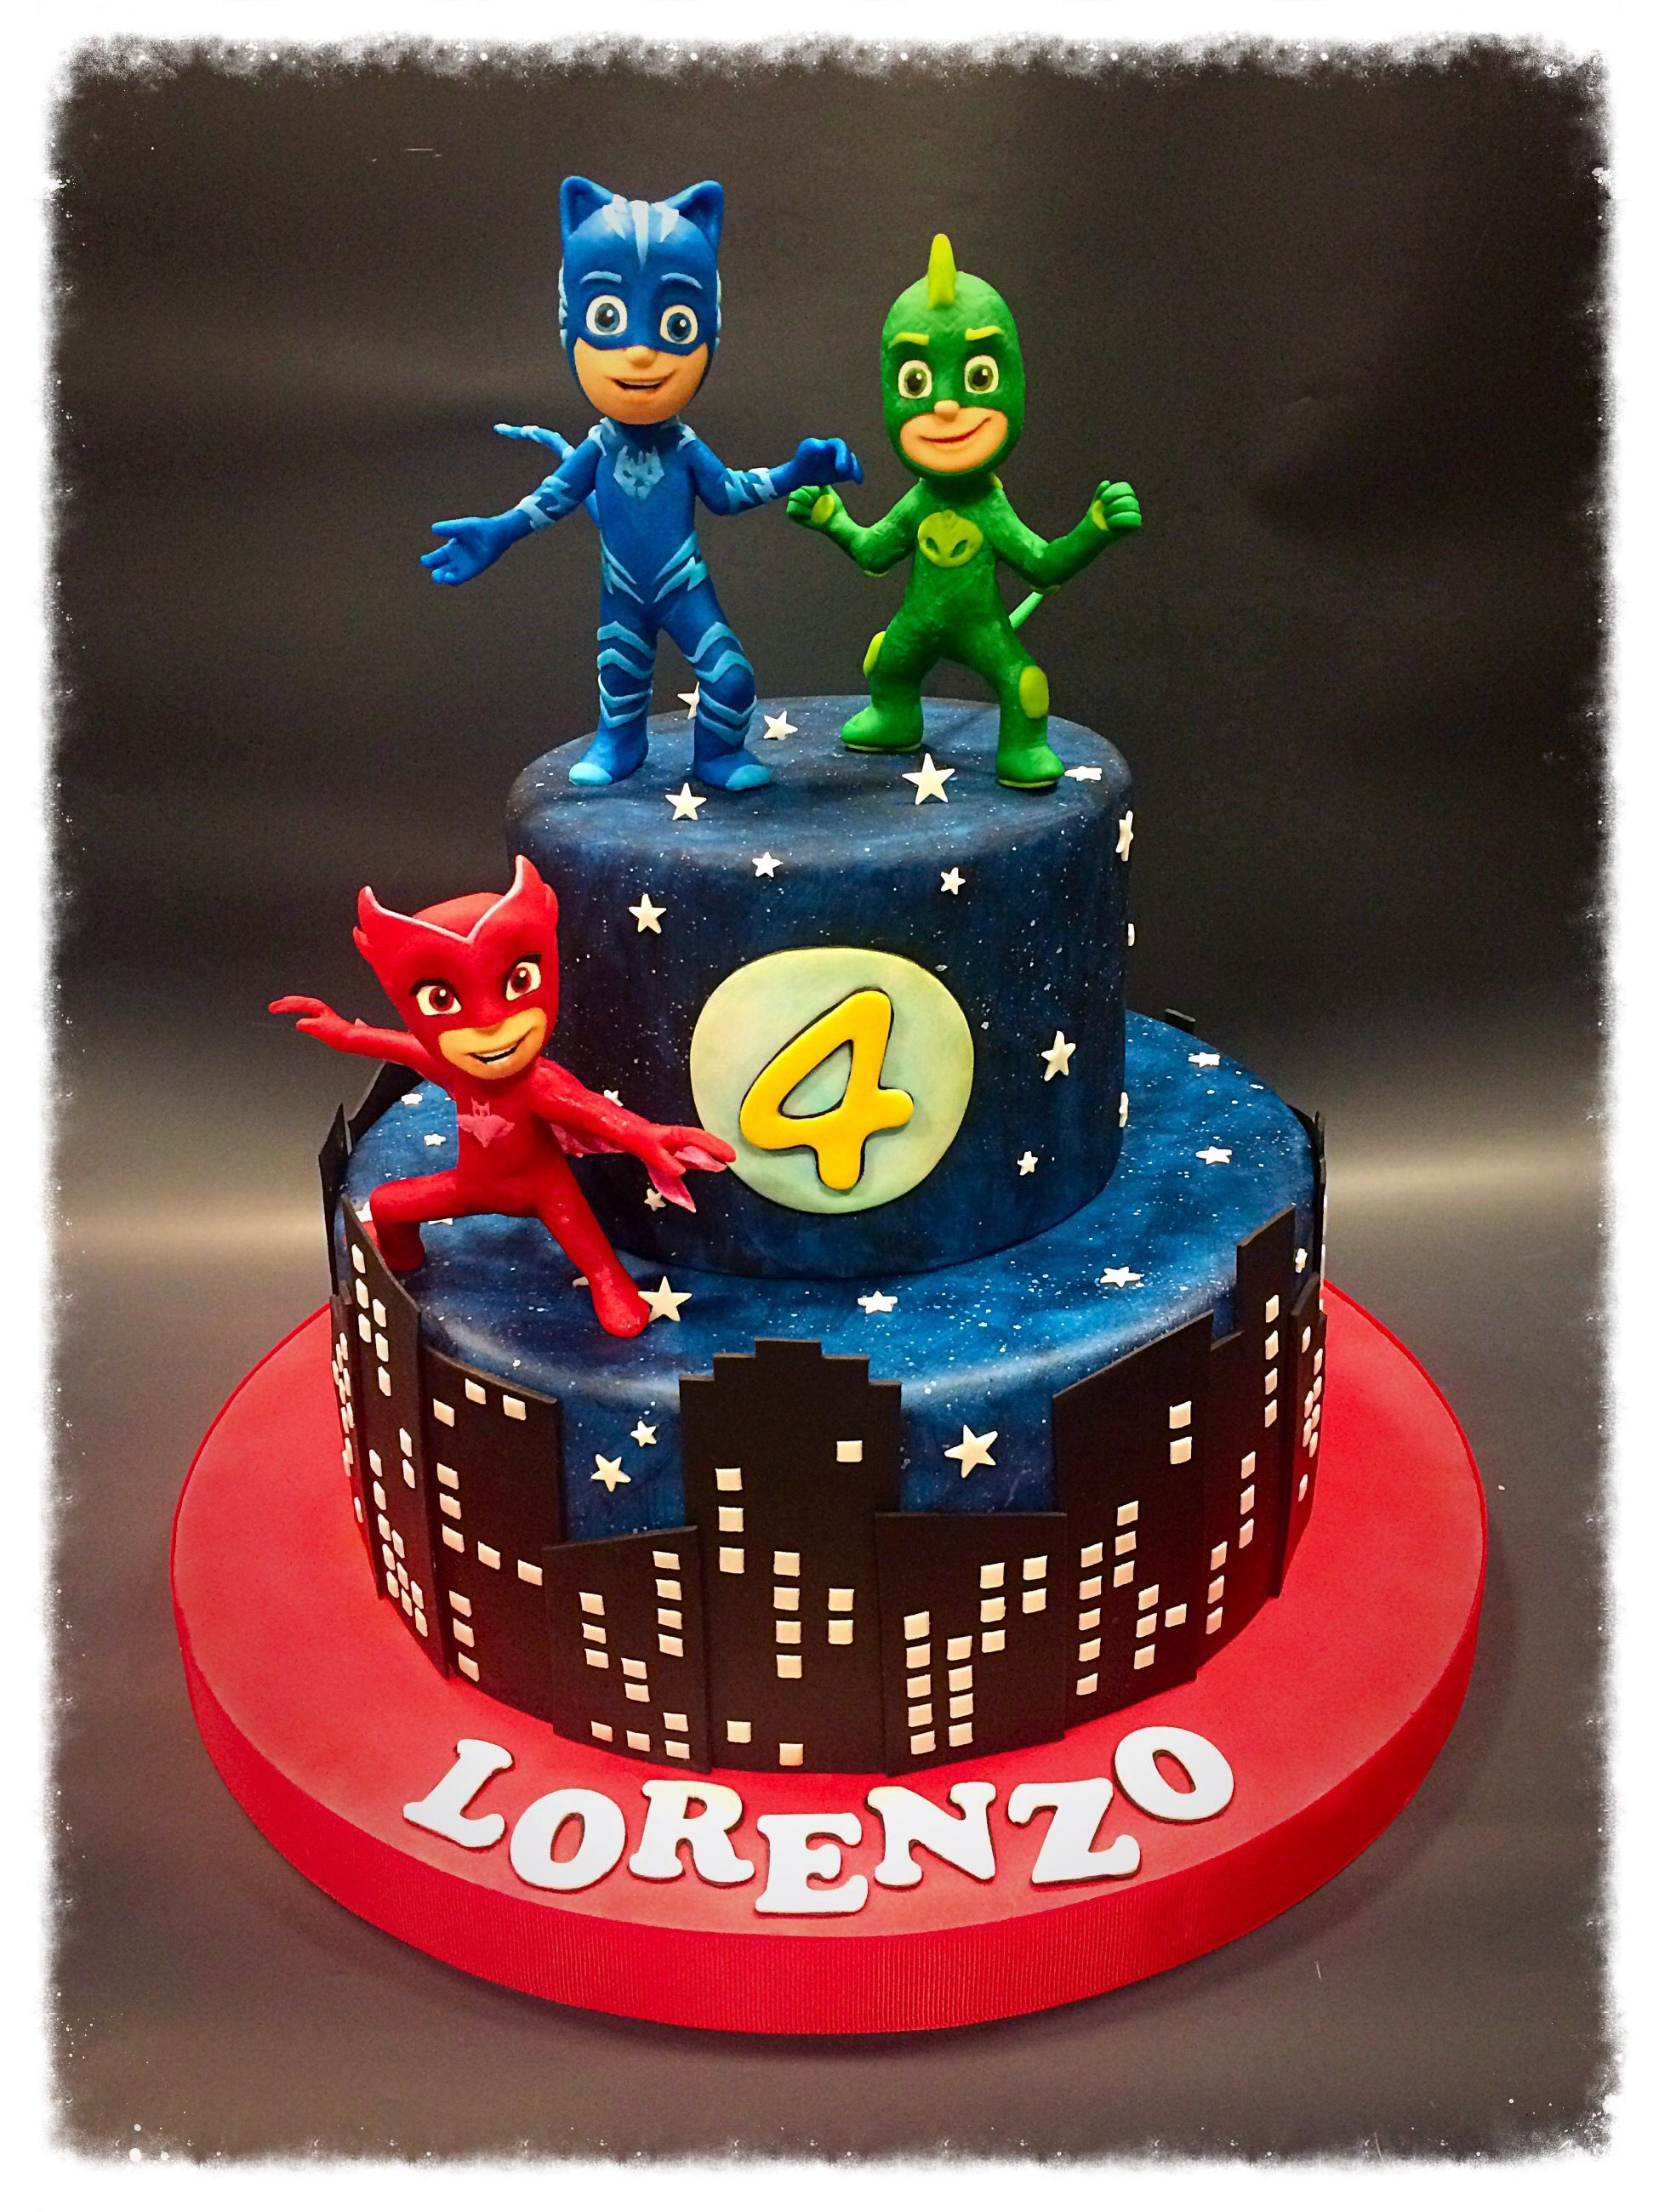 pantofi de separare preturi ieftine magazin online Torta lolo   Pj masks birthday cake, Party cakes, Pj mask cupcakes